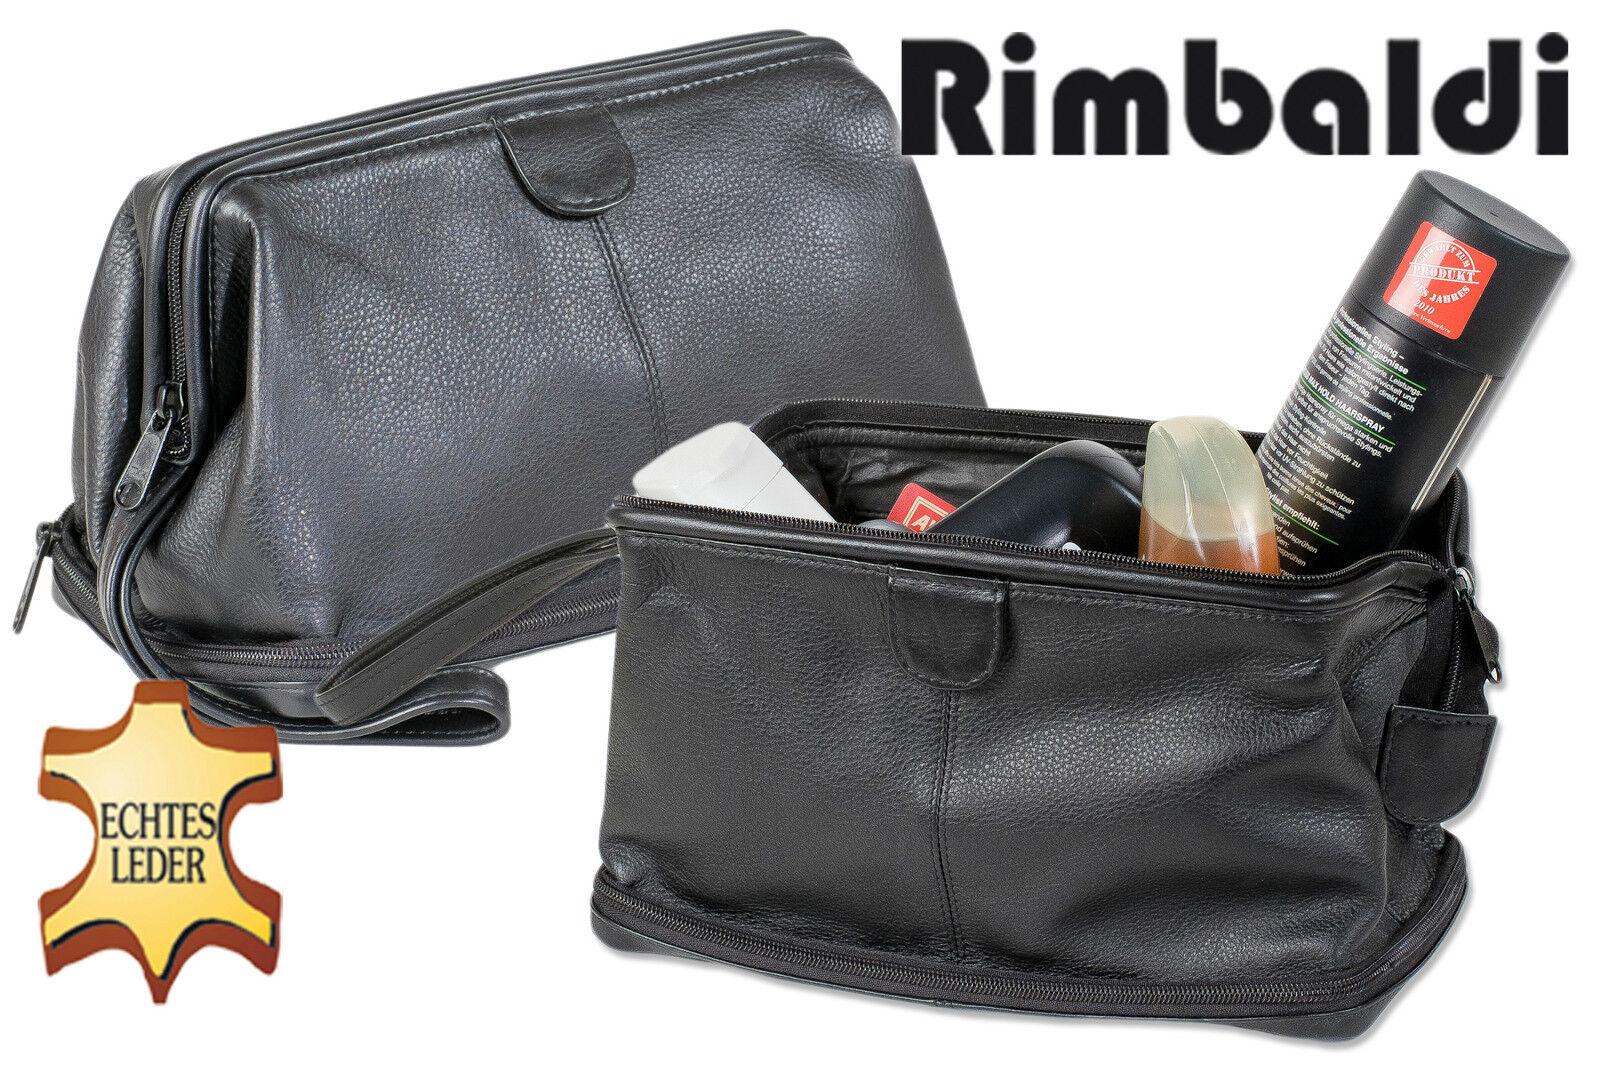 Rimbaldi culture sac en en cuir avec extrafach dans le sol en en noir 618552